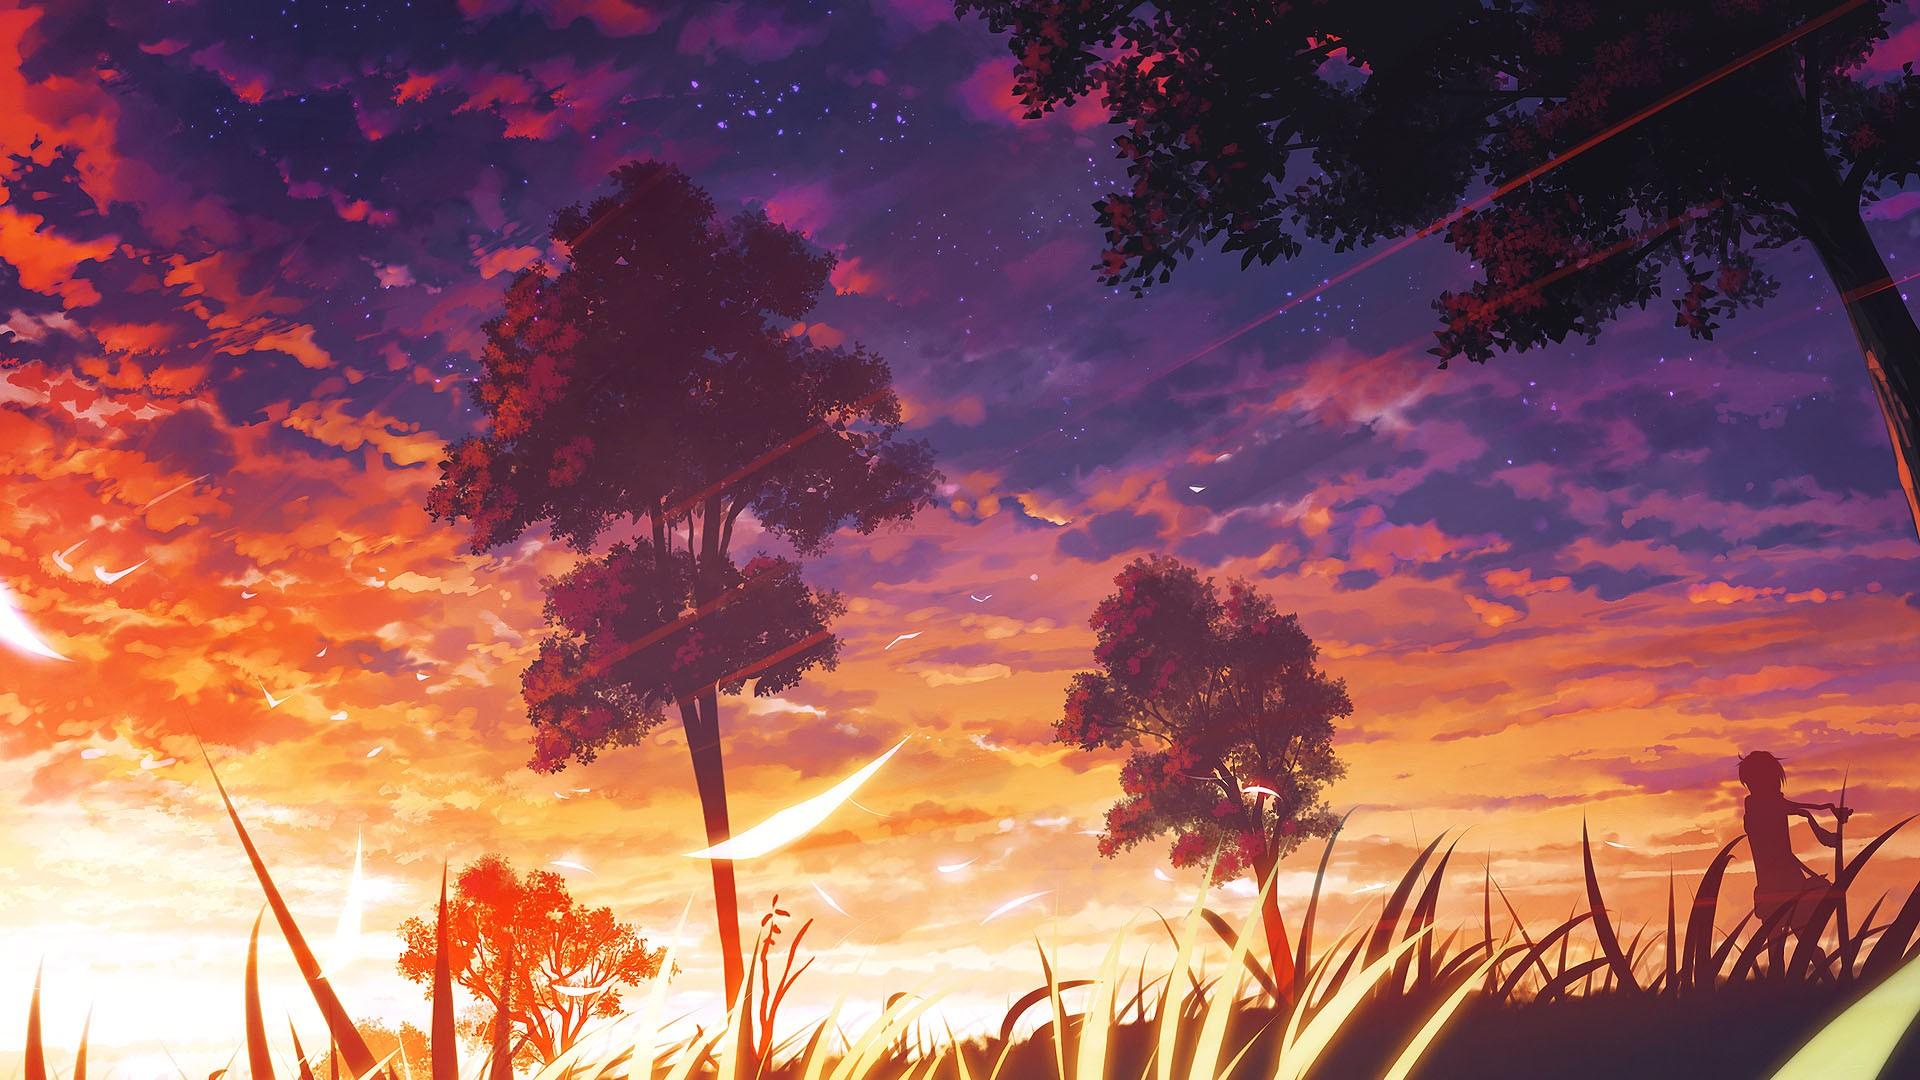 Anime 1920x1080 trees anime manga forest anime girls artwork clouds nature sky sunlight